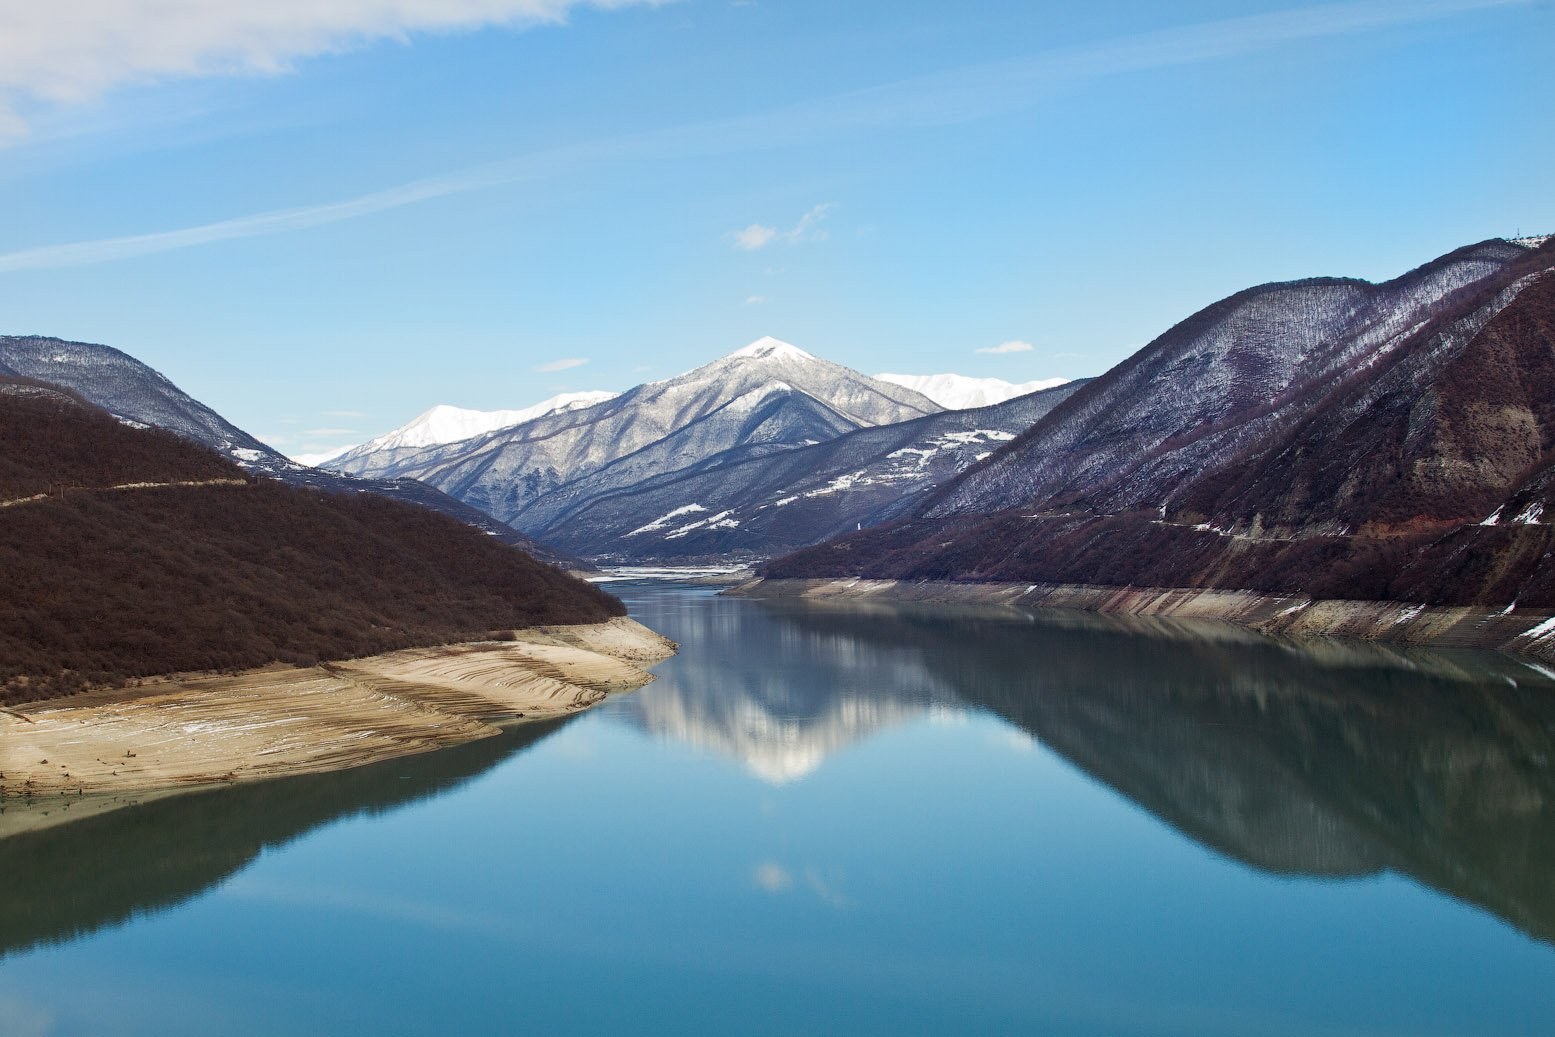 гудаури, водохранилище, грузия, Артем Верхогляд